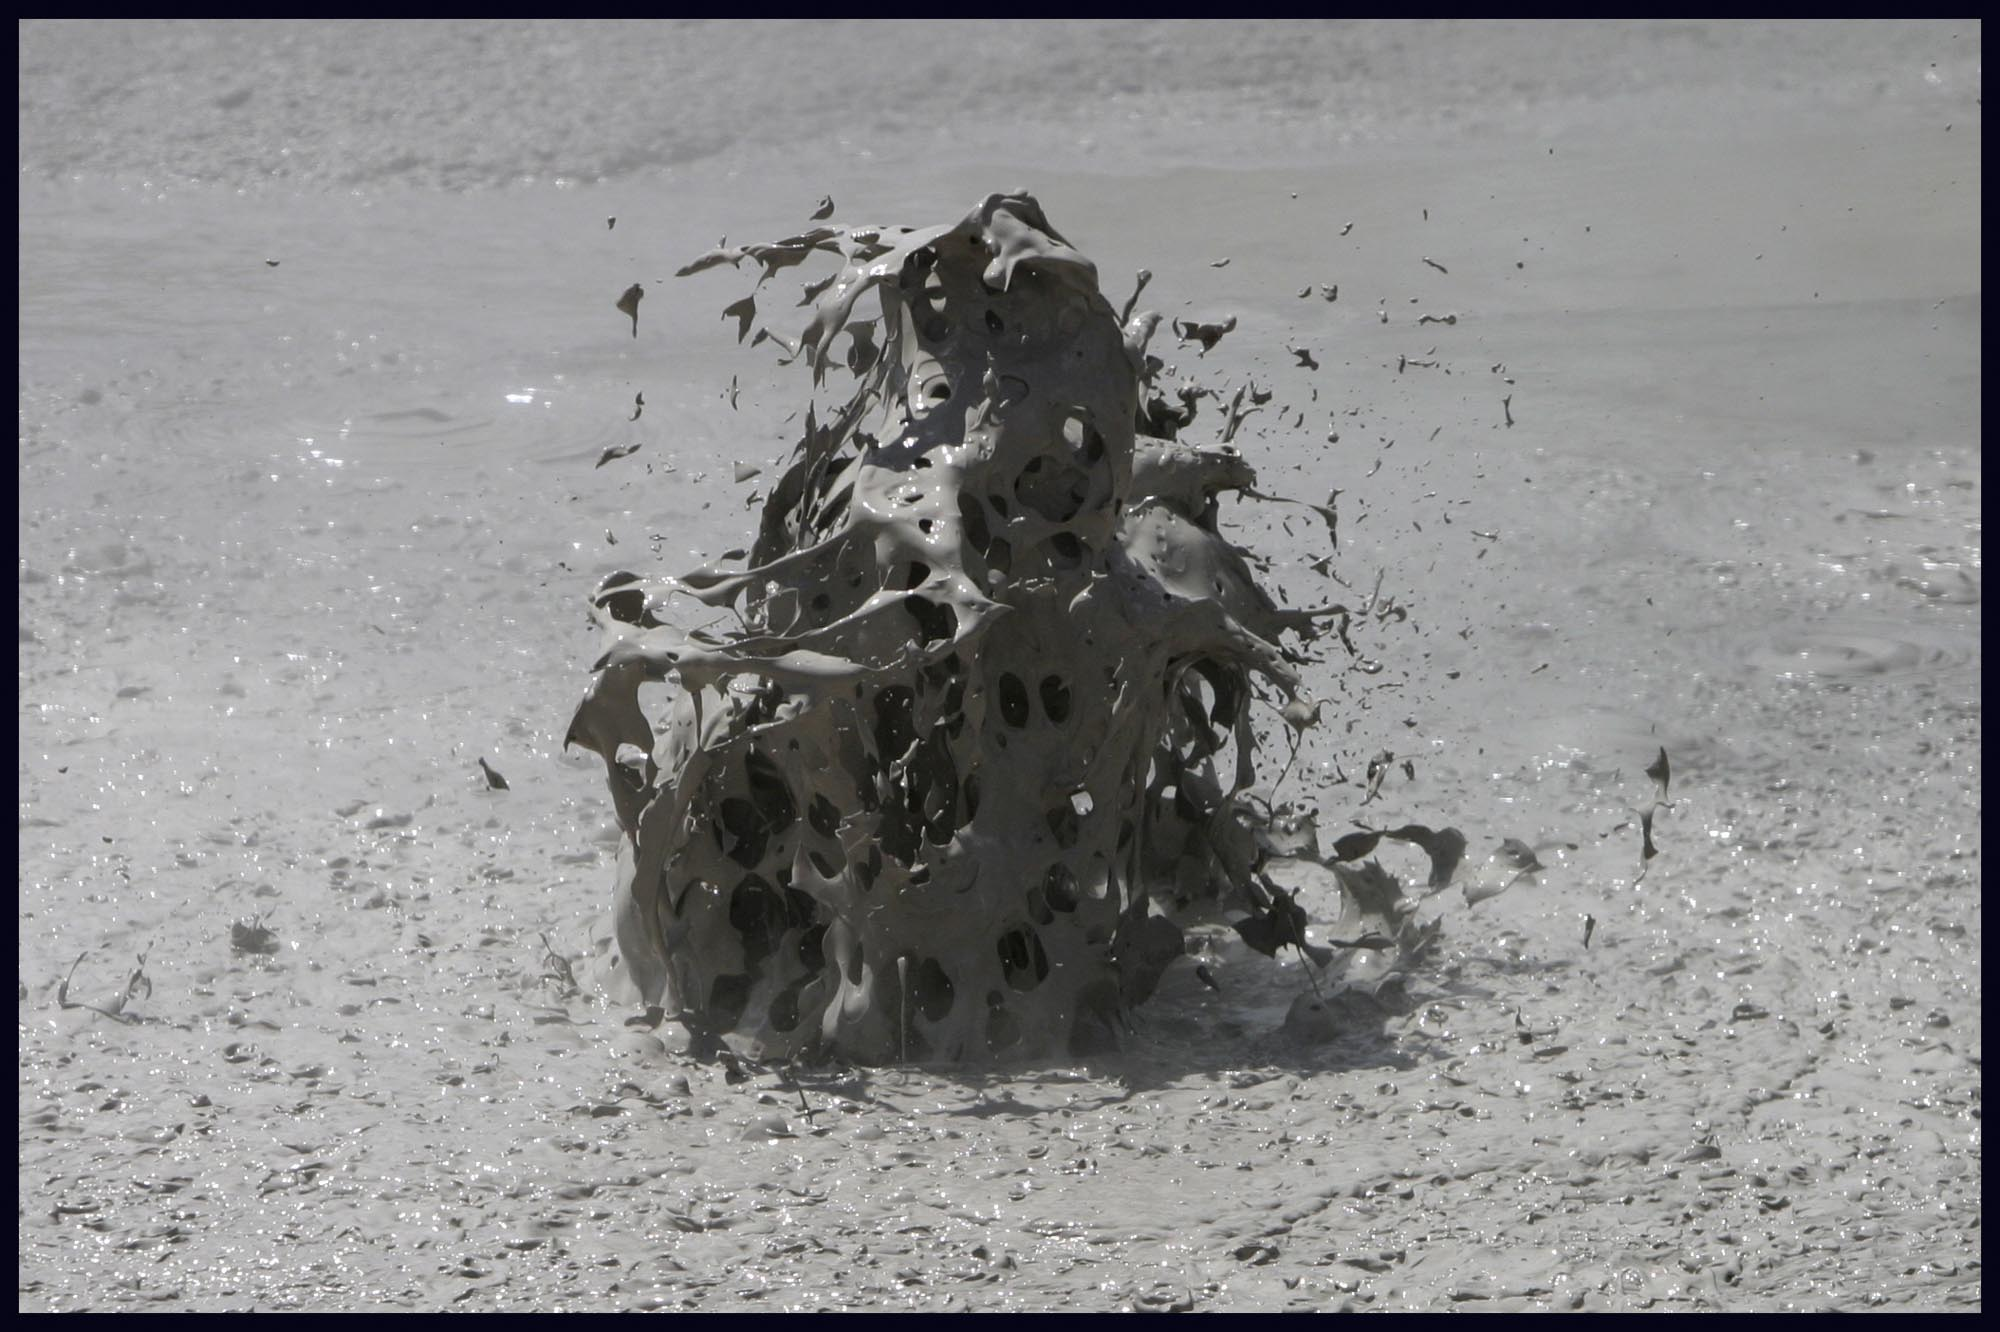 Exploding_Mud.jpg